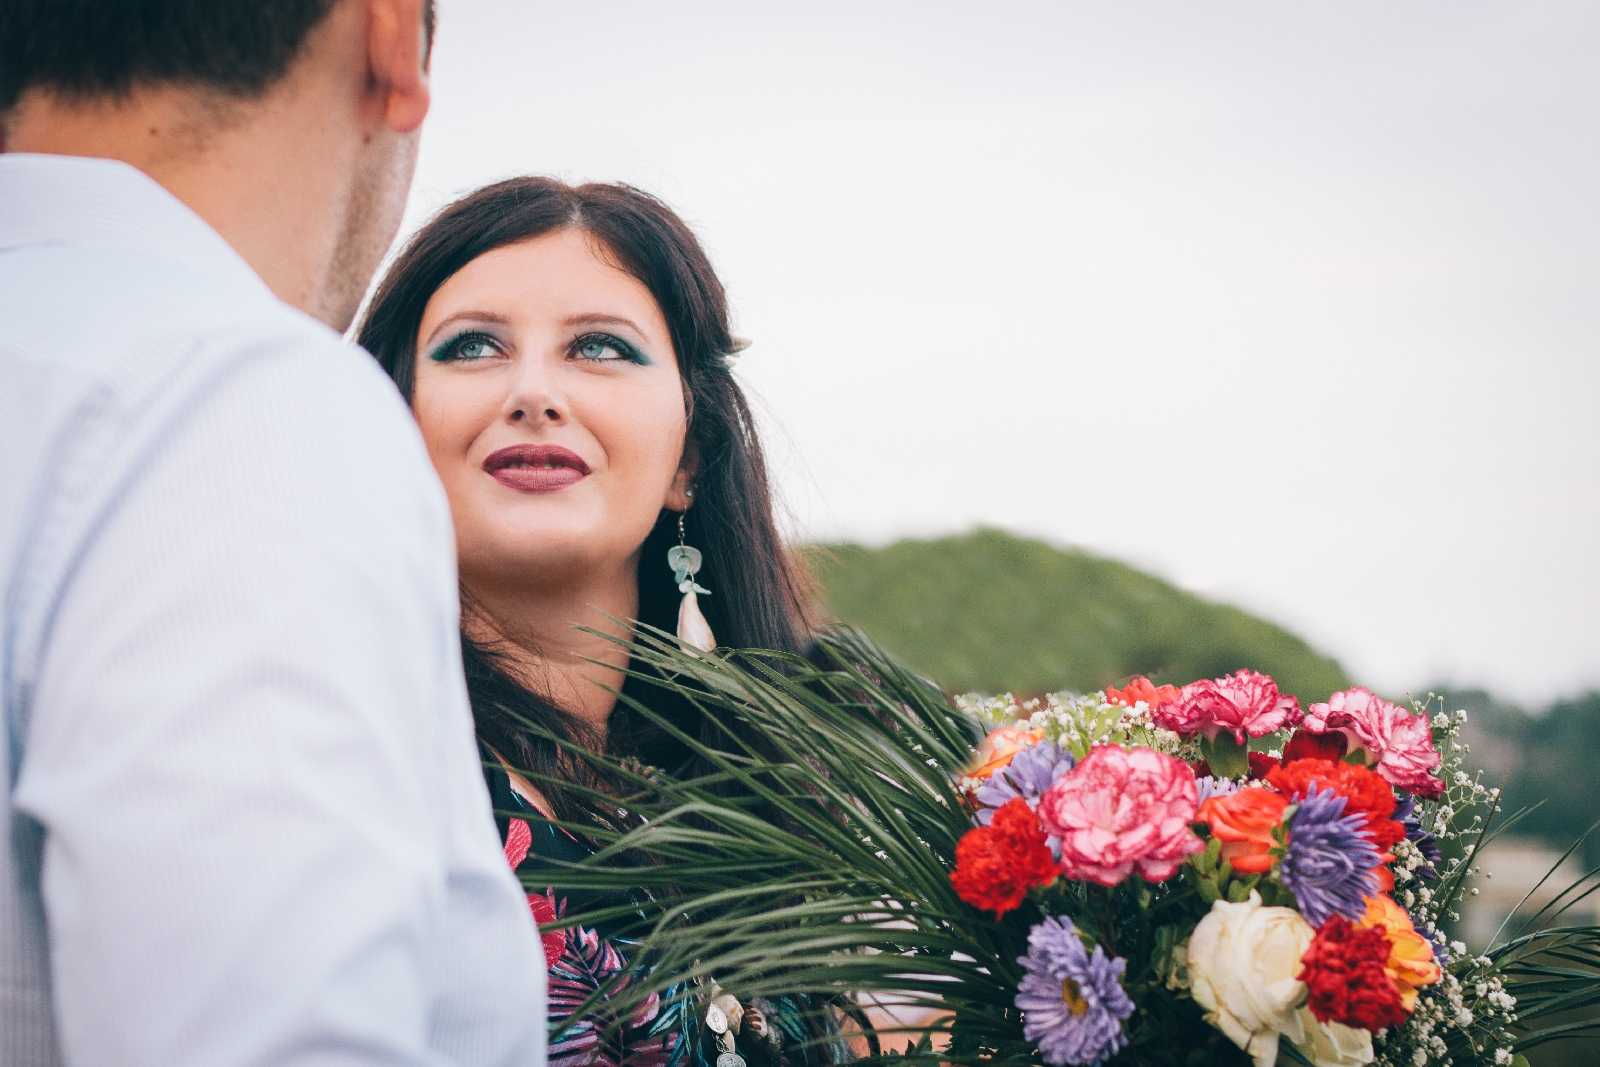 075-2018-09-22-Engagement-Alessandra-e-Igor-Pizzone-078